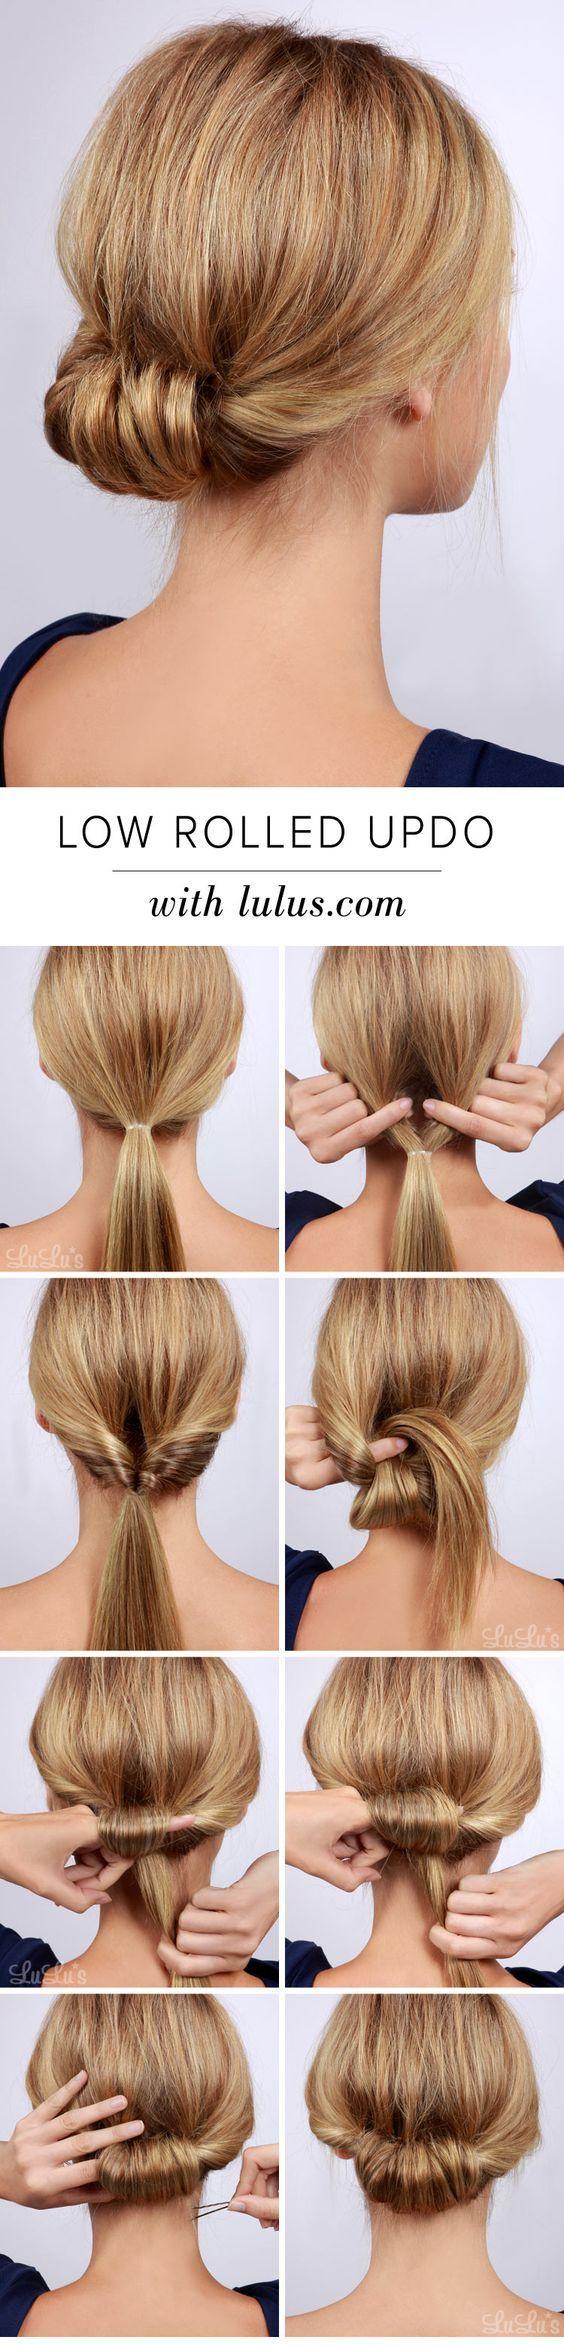 http://chasseursdastuces.com/21-coiffures-faciles-paresseuses/